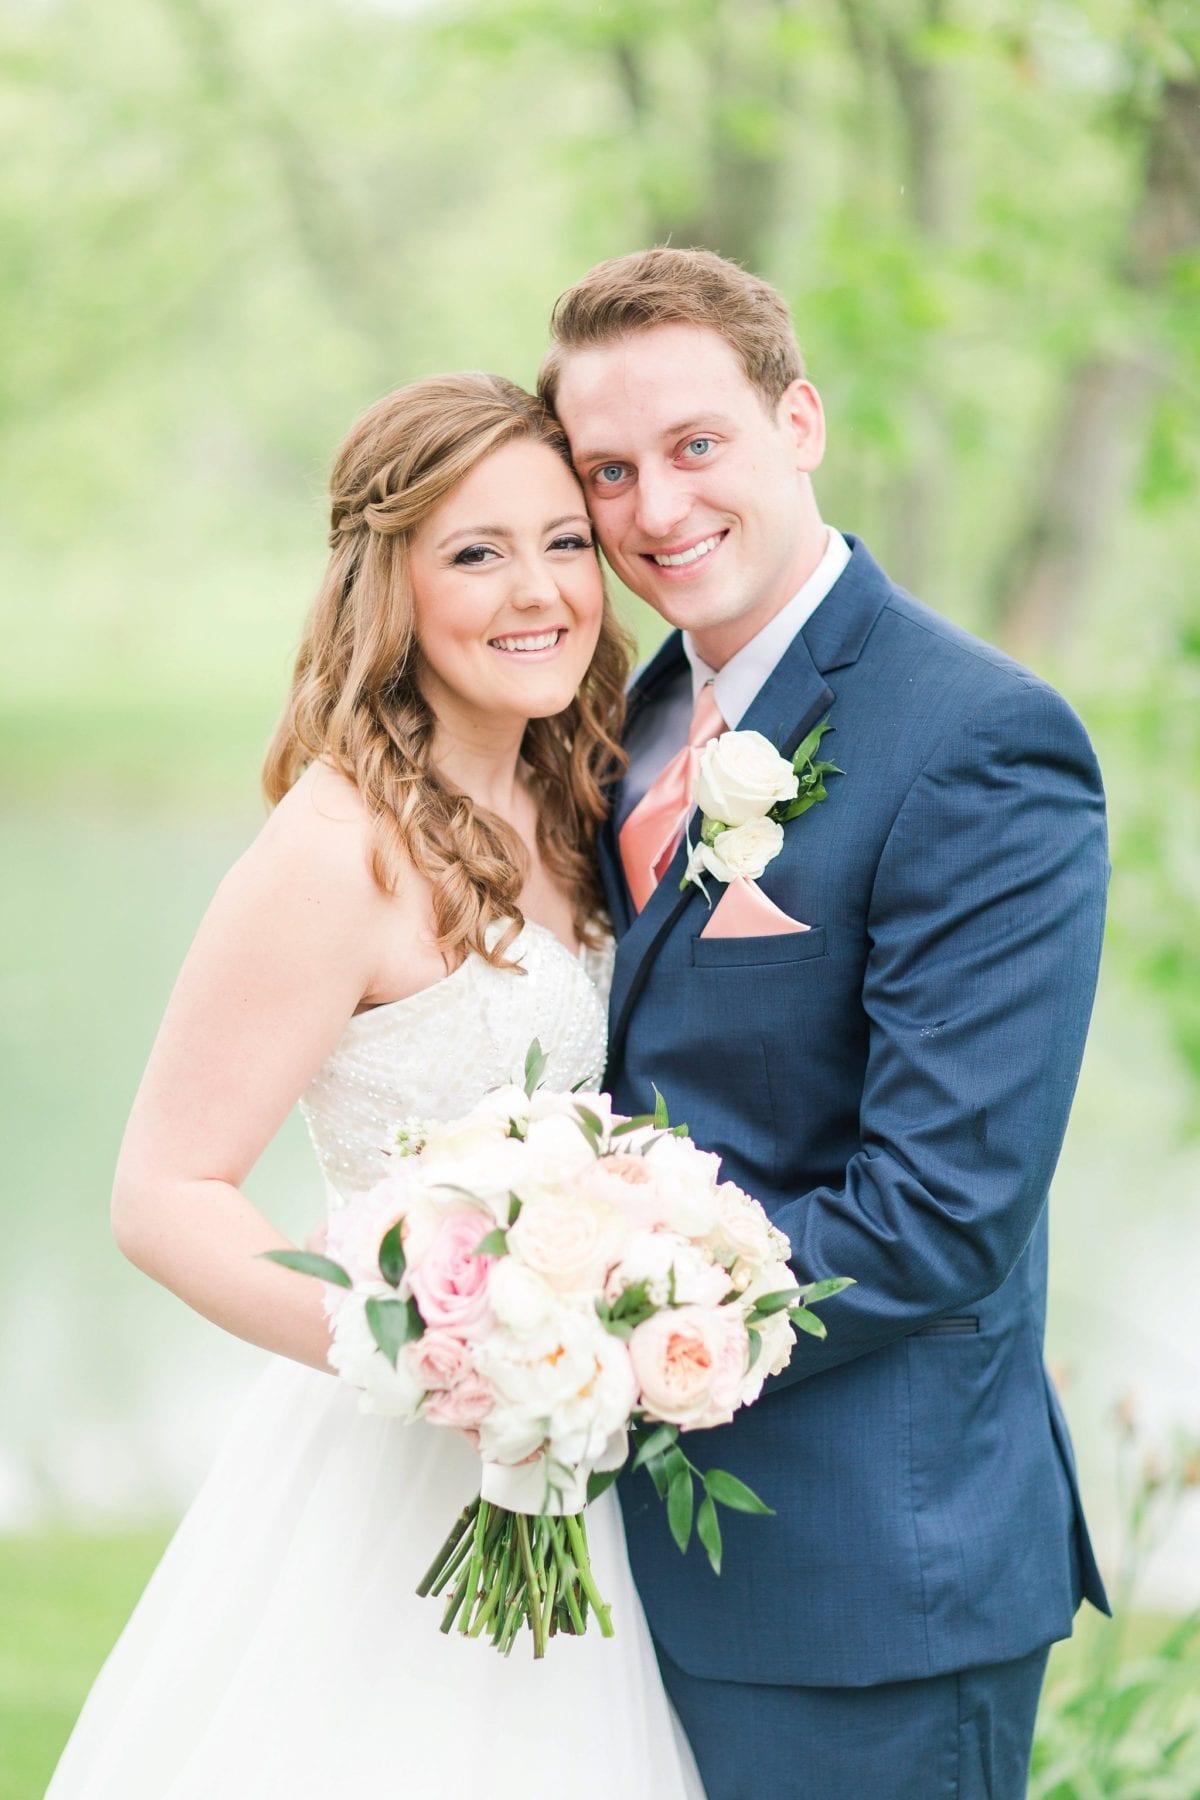 Justin & Megan Big Spring Farm Wedding Photos-101.jpg